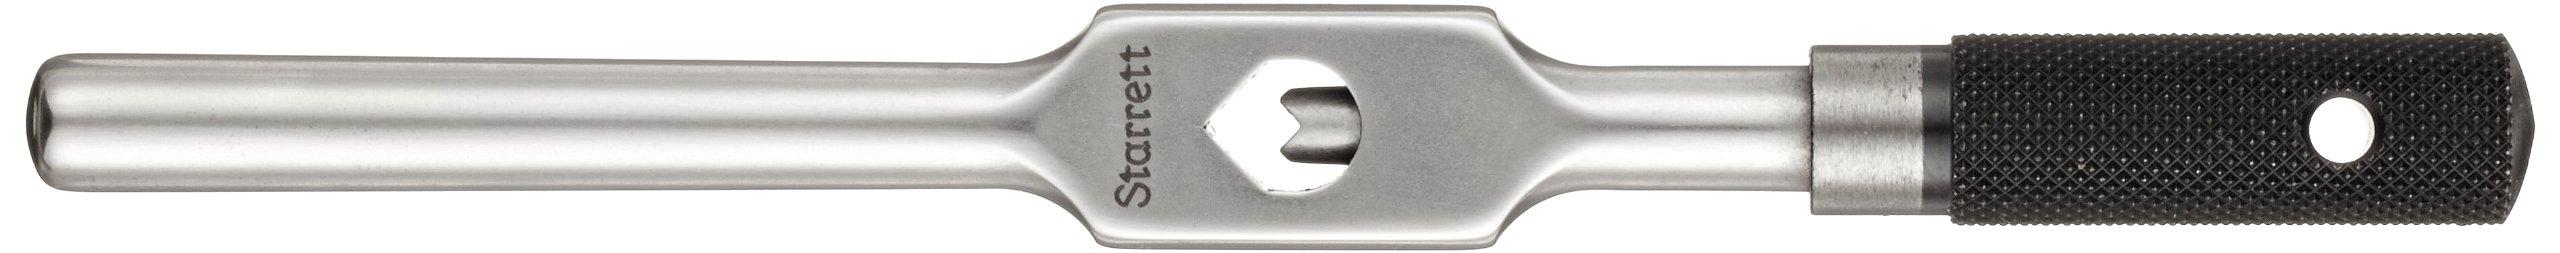 Starrett 91A Tap Wrench, 1/16'' - 1/4'' Tap Size, 3/32'' - 5/32'' Square Shank Diameter, 6'' Body Length by Starrett